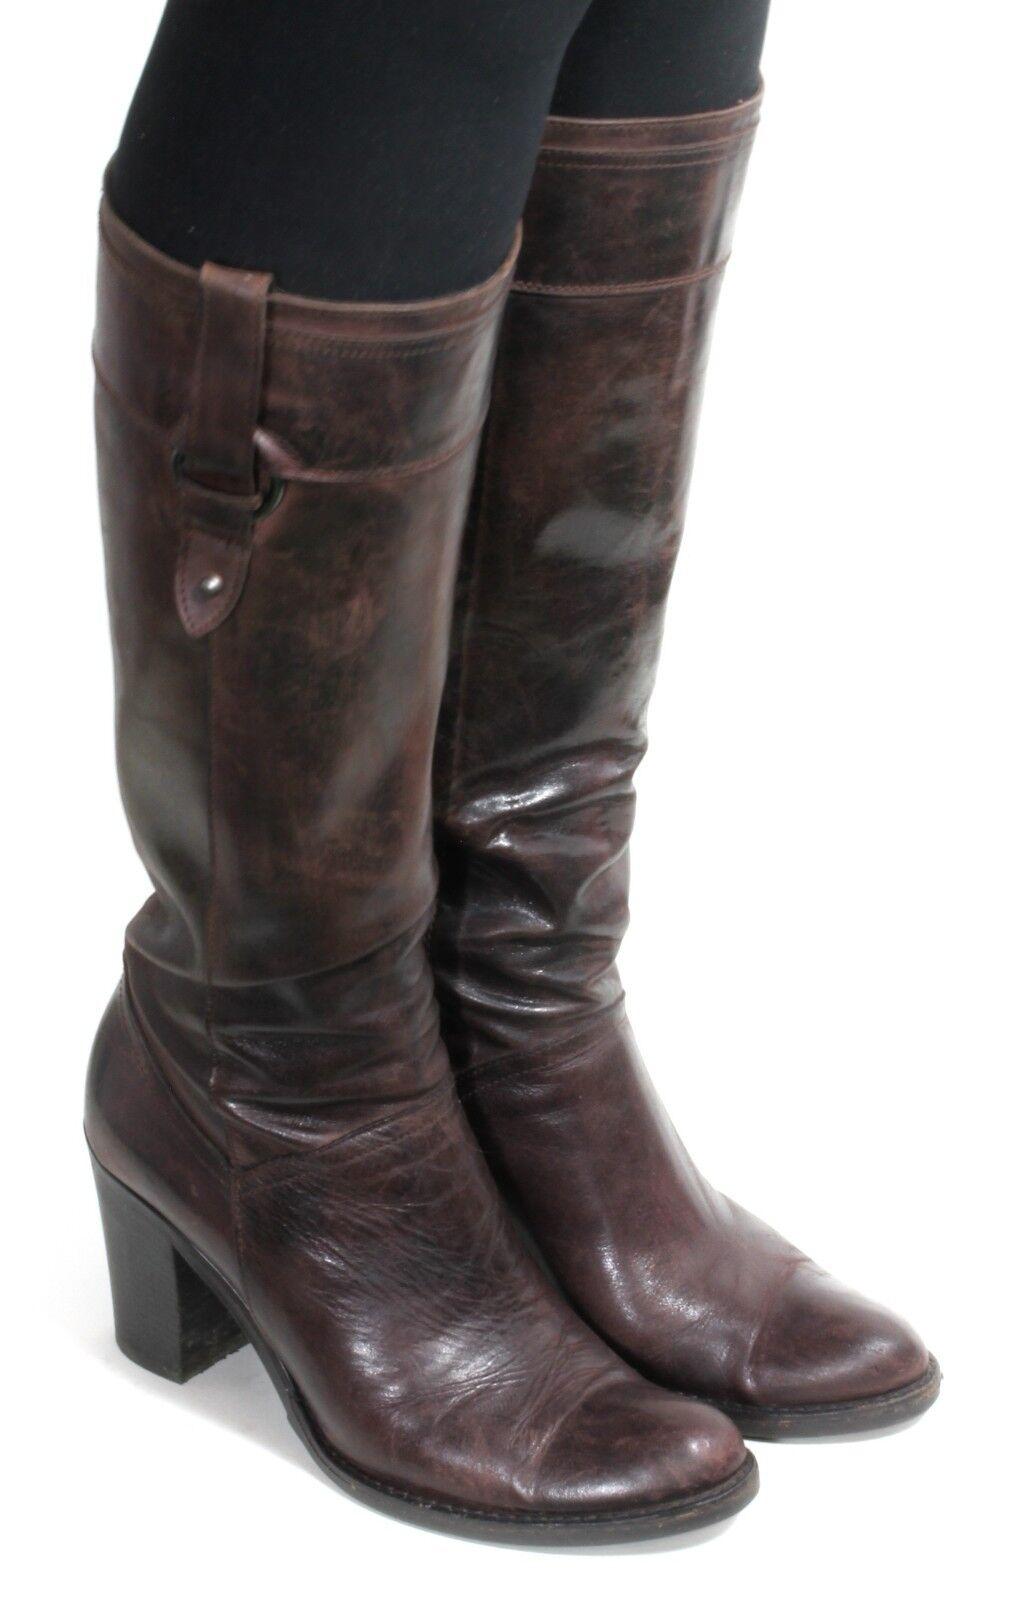 Damenstiefel Vintage Stiefel Blogger Damenschuhe Piu High Heels Langschaftstiefel 38